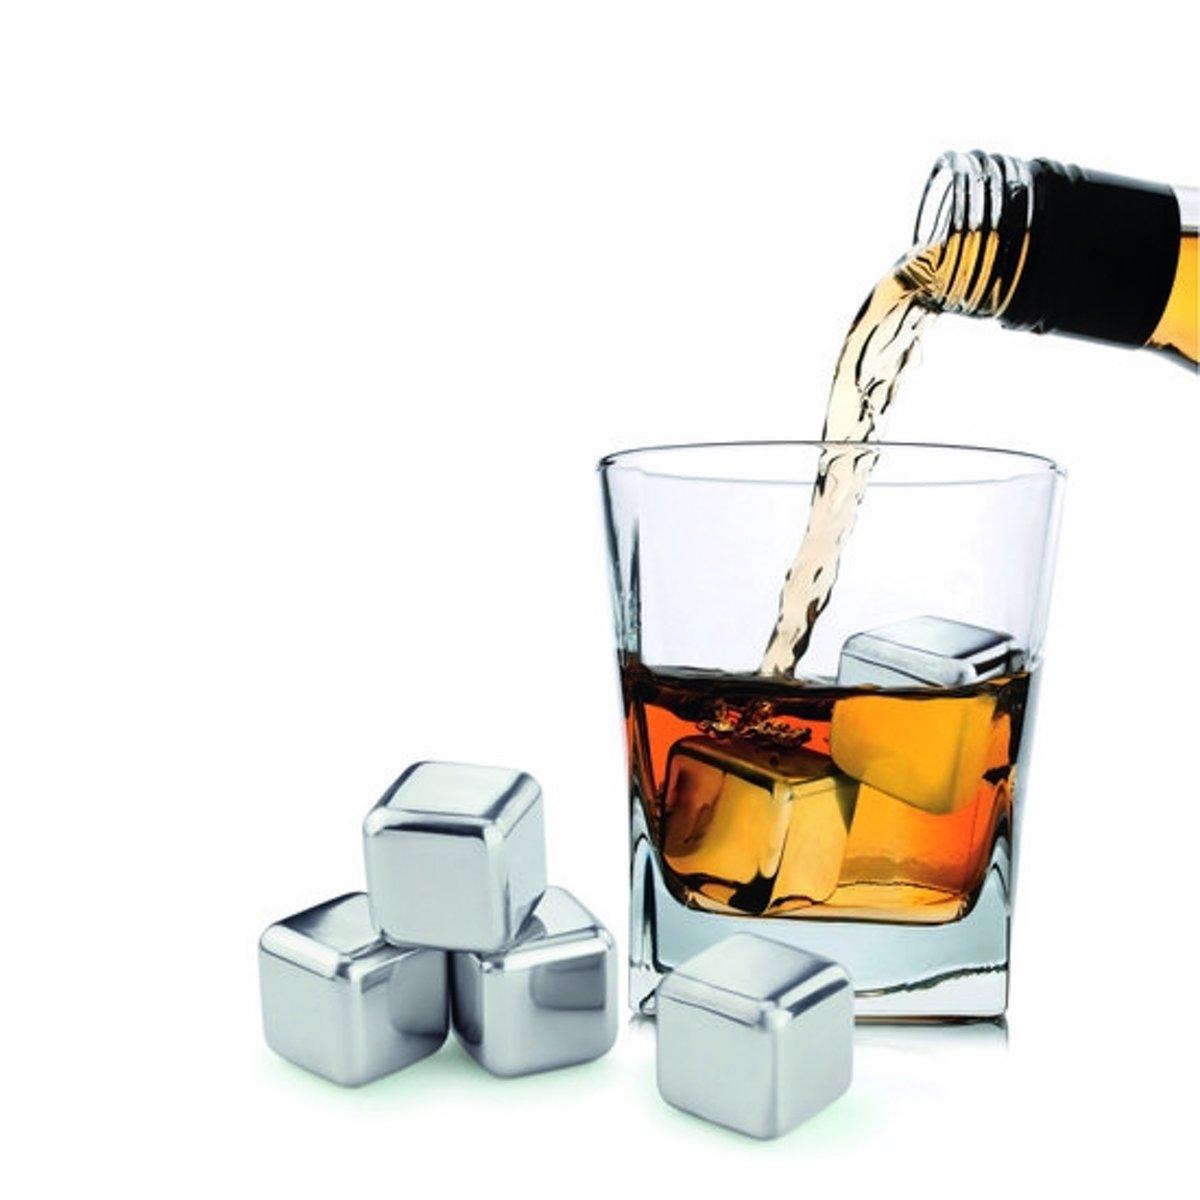 Whiskey Stones Ijsblokken - RVS Wiskey Stenen - Whisky Ijsblokjes Ice Cub Koelstenen kopen